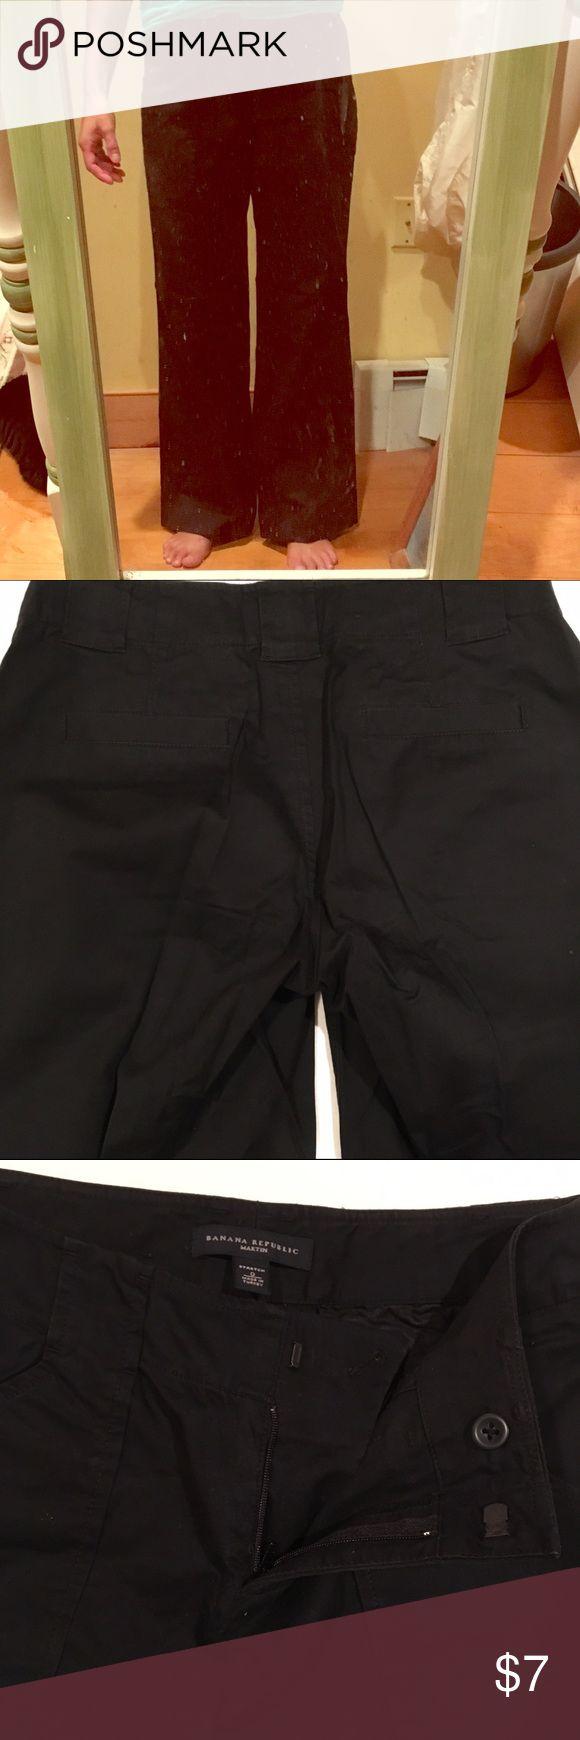 ⭐️Banana Republic black cotton pants Banana Republic Martin stretch.  Worn once excellent condition. Banana Republic Pants